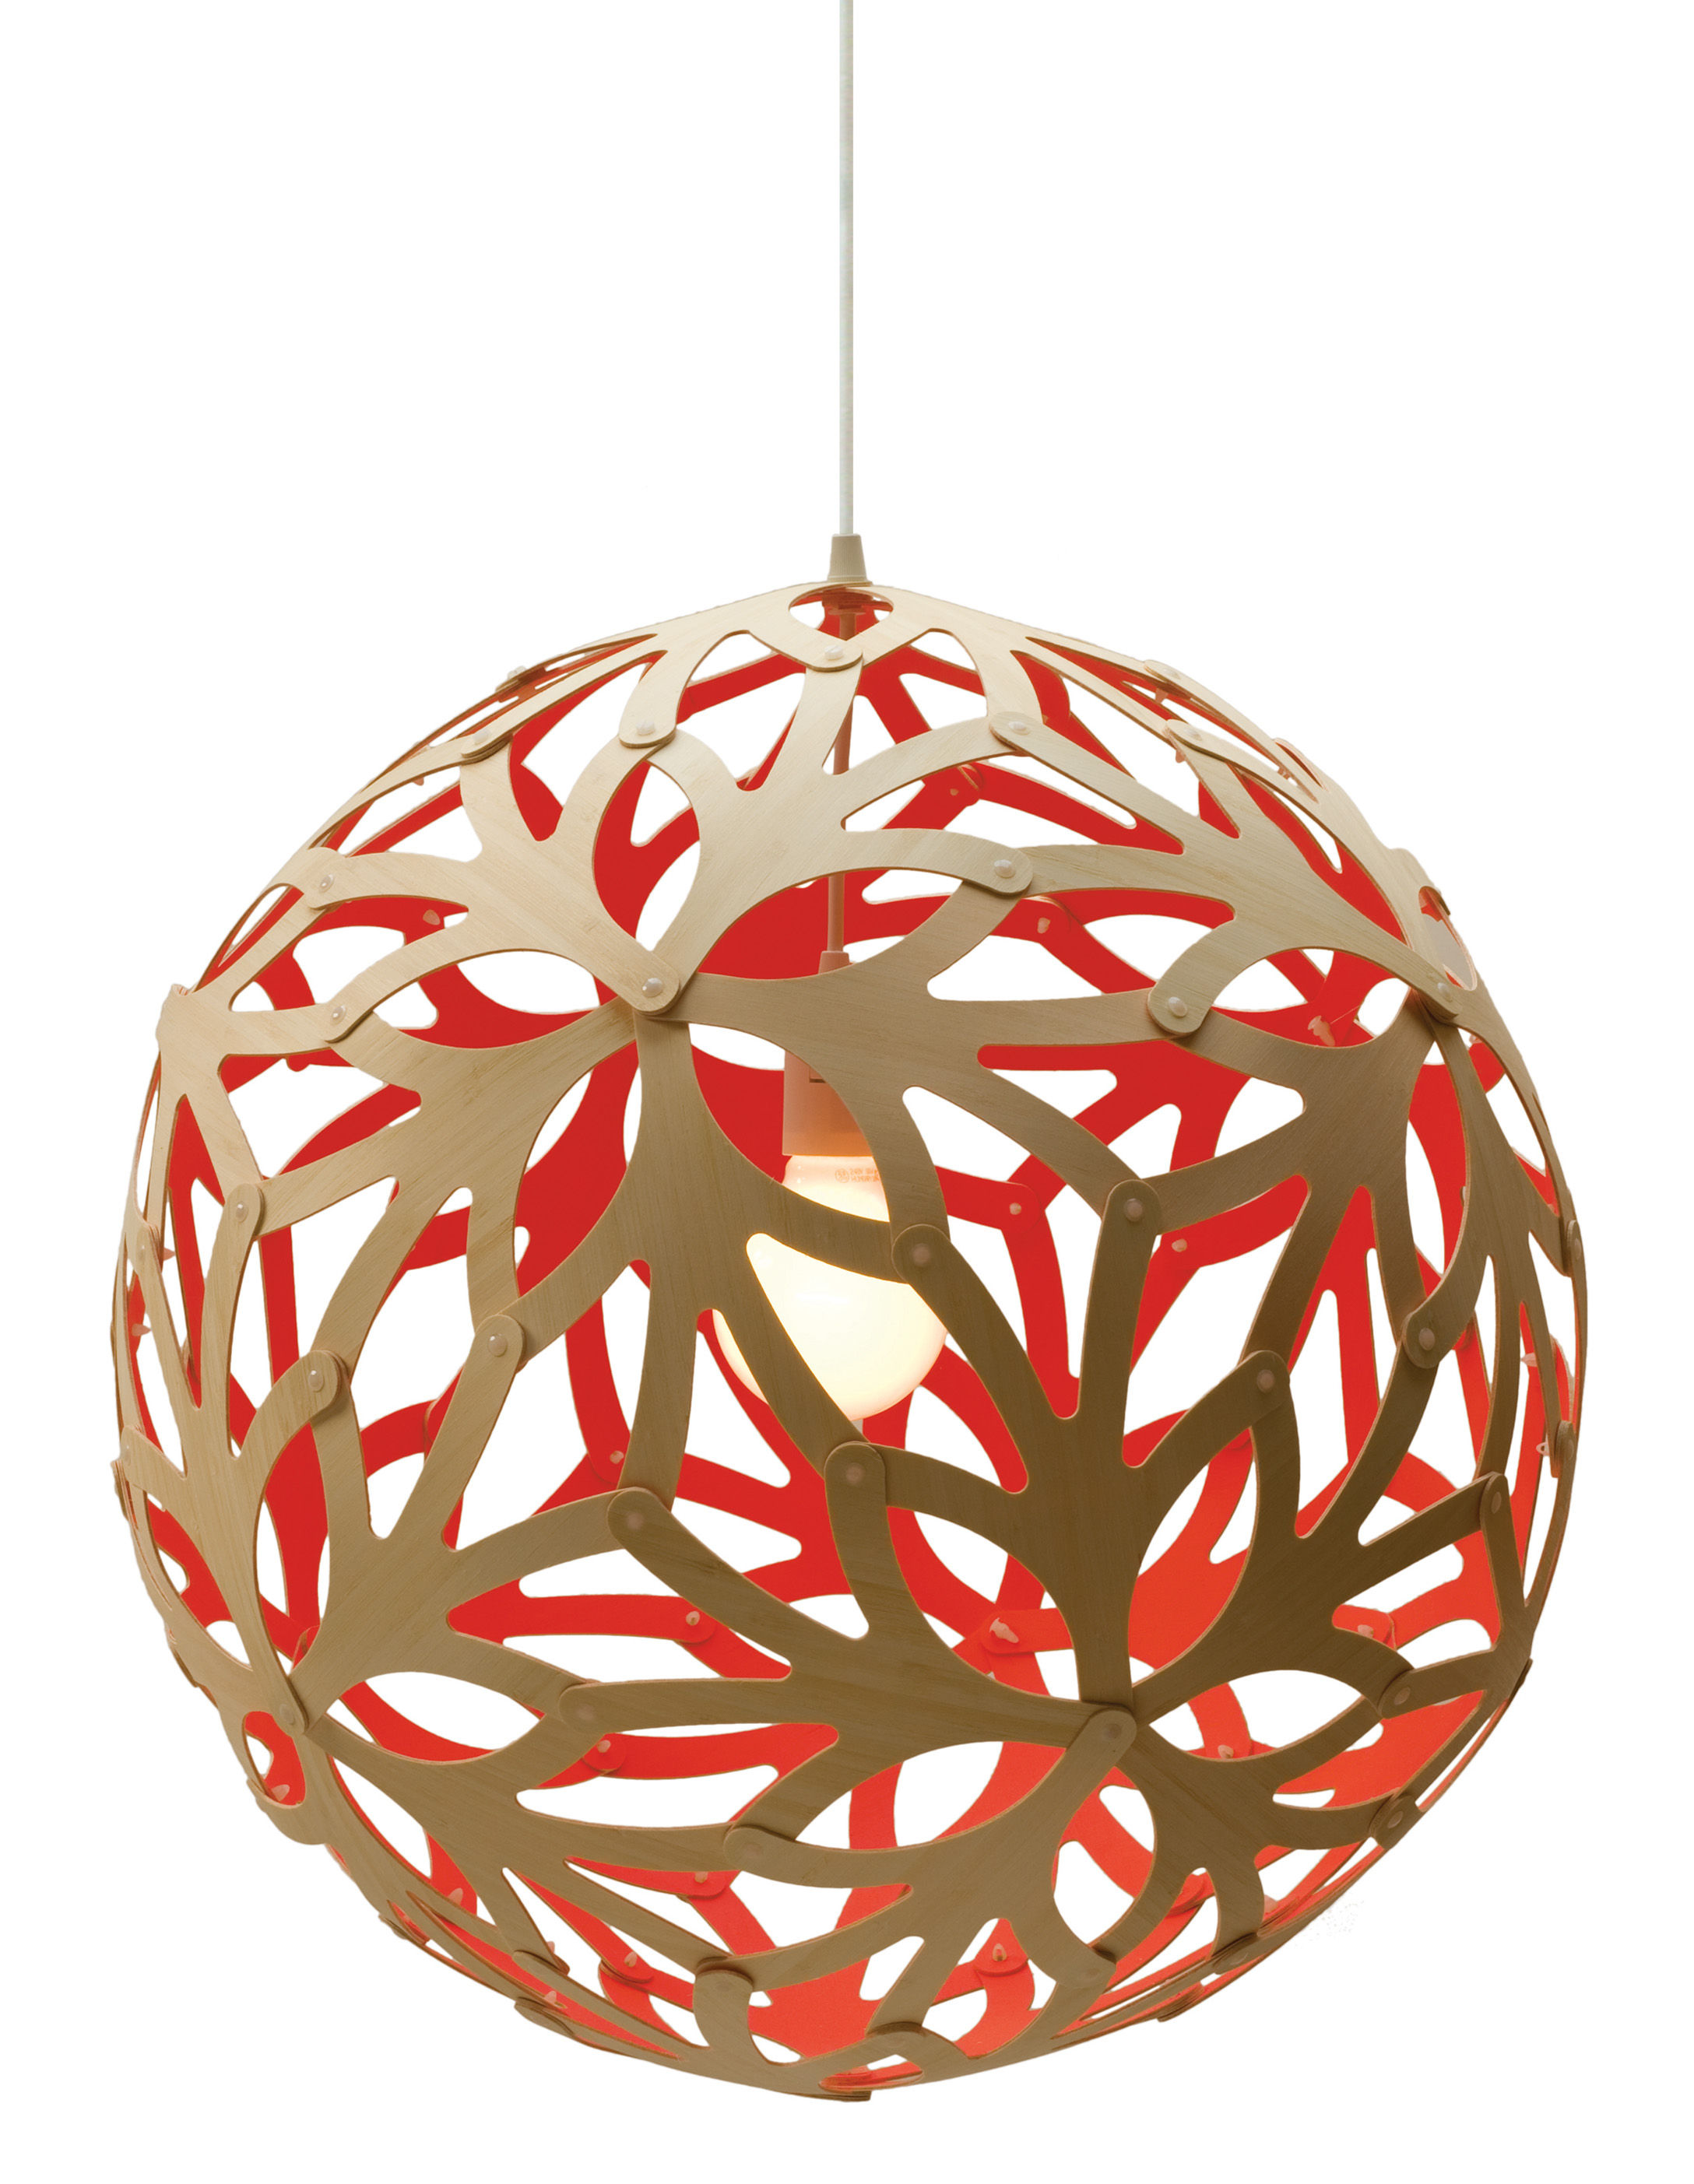 Luminaire - Suspensions - Suspension Floral / Ø 40 cm - Bicolore rouge & bois - David Trubridge - Rouge / Bois naturel - Pin